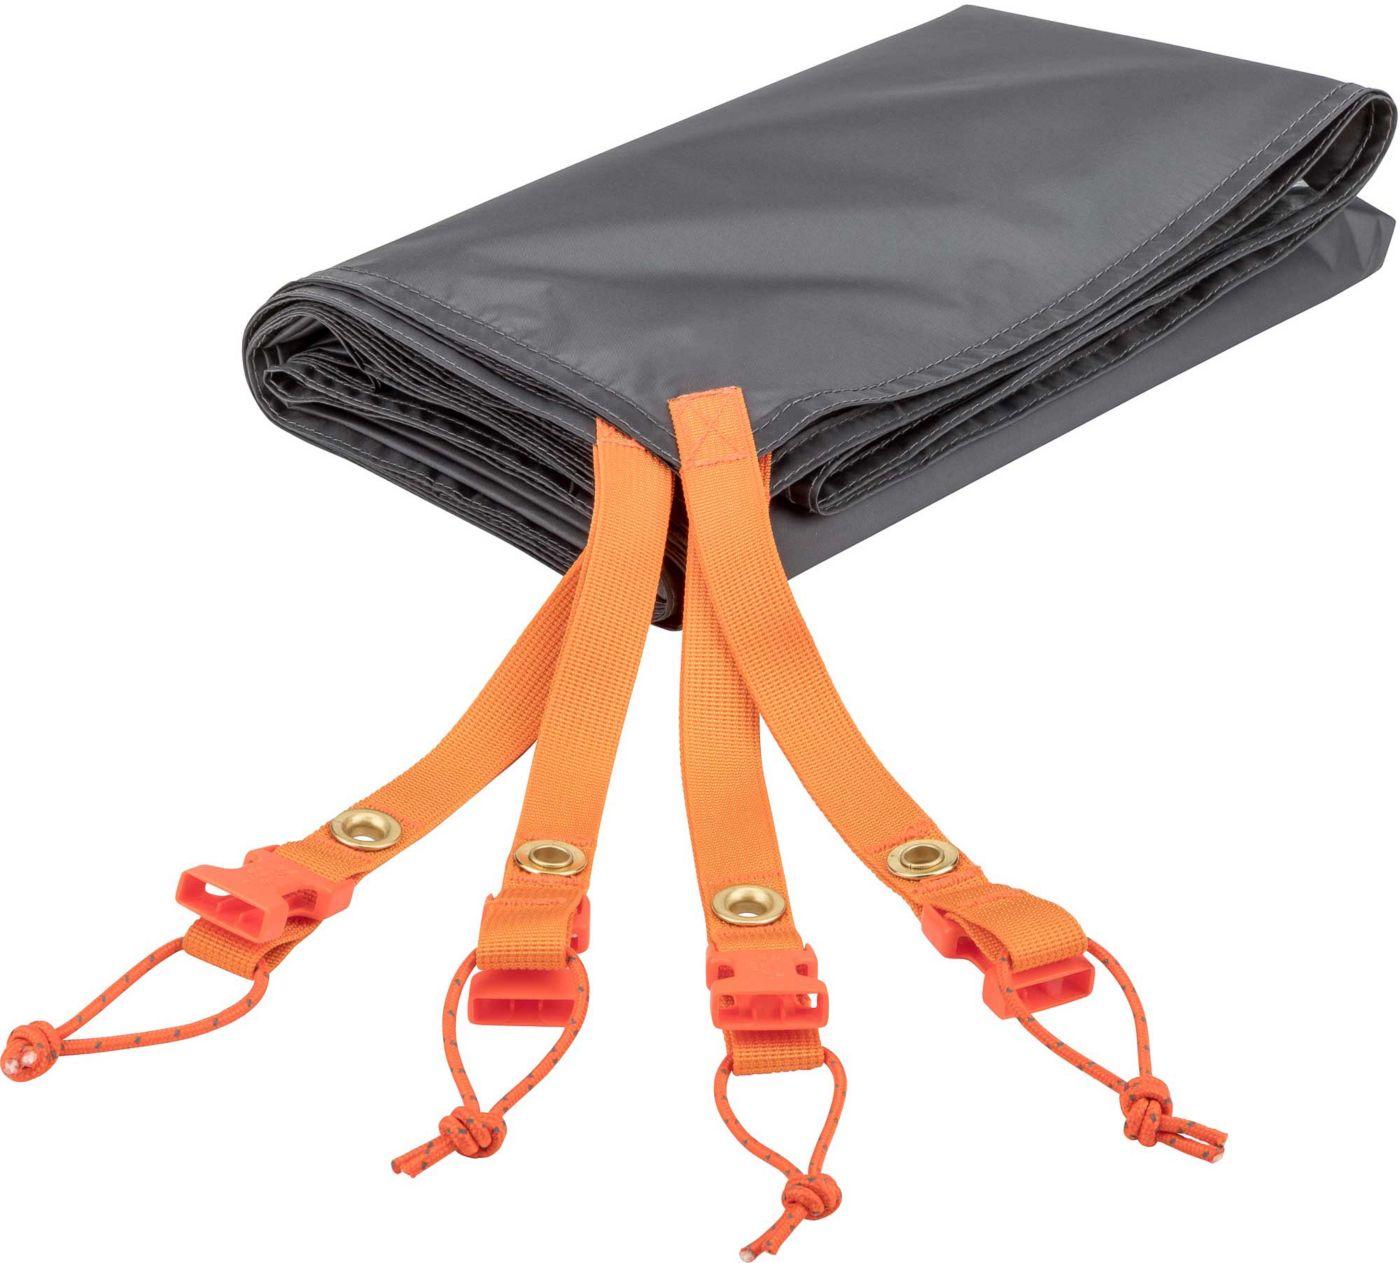 Marmot Limelight 4-Person Ultralight Tent Footprint